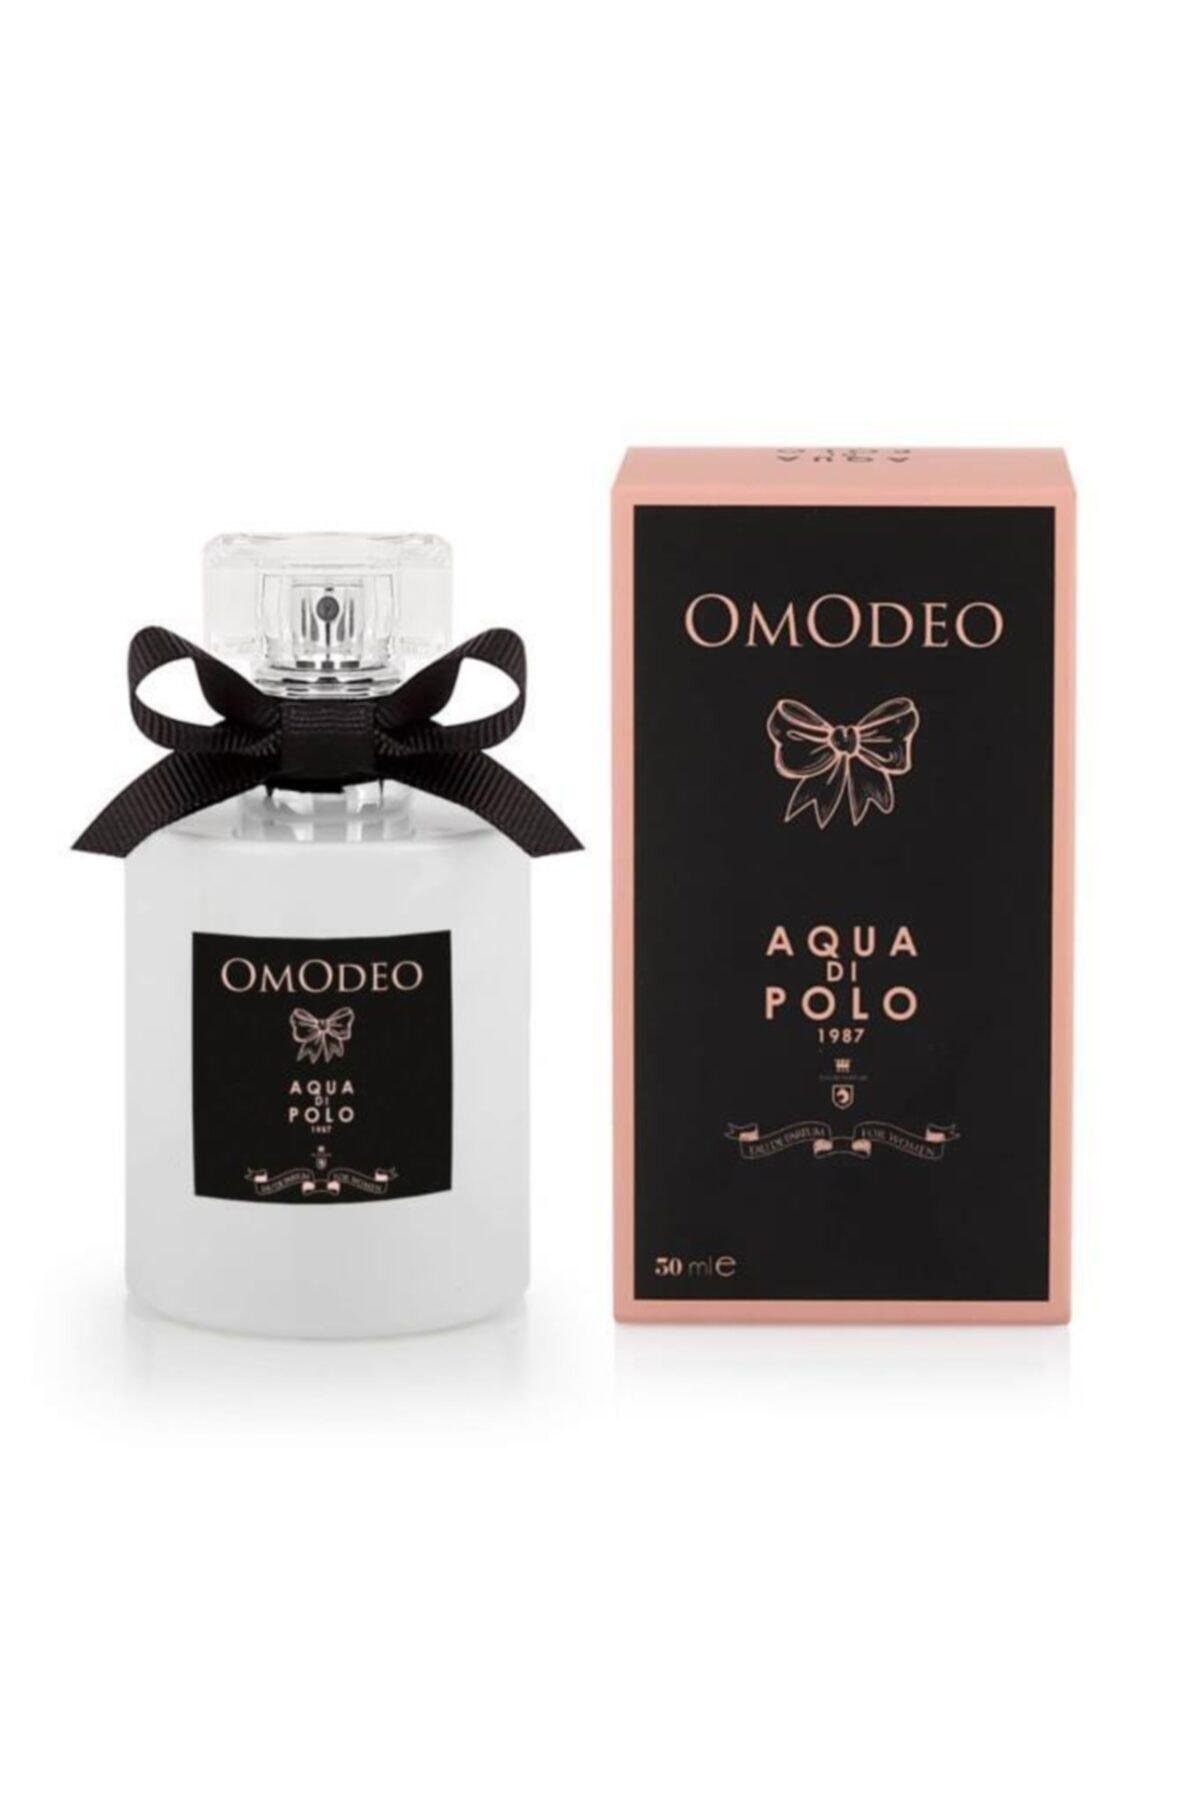 Aqua Di Polo 1987 Omodeo Edp 50 ml Kadın Parfümü   5301010028837 1